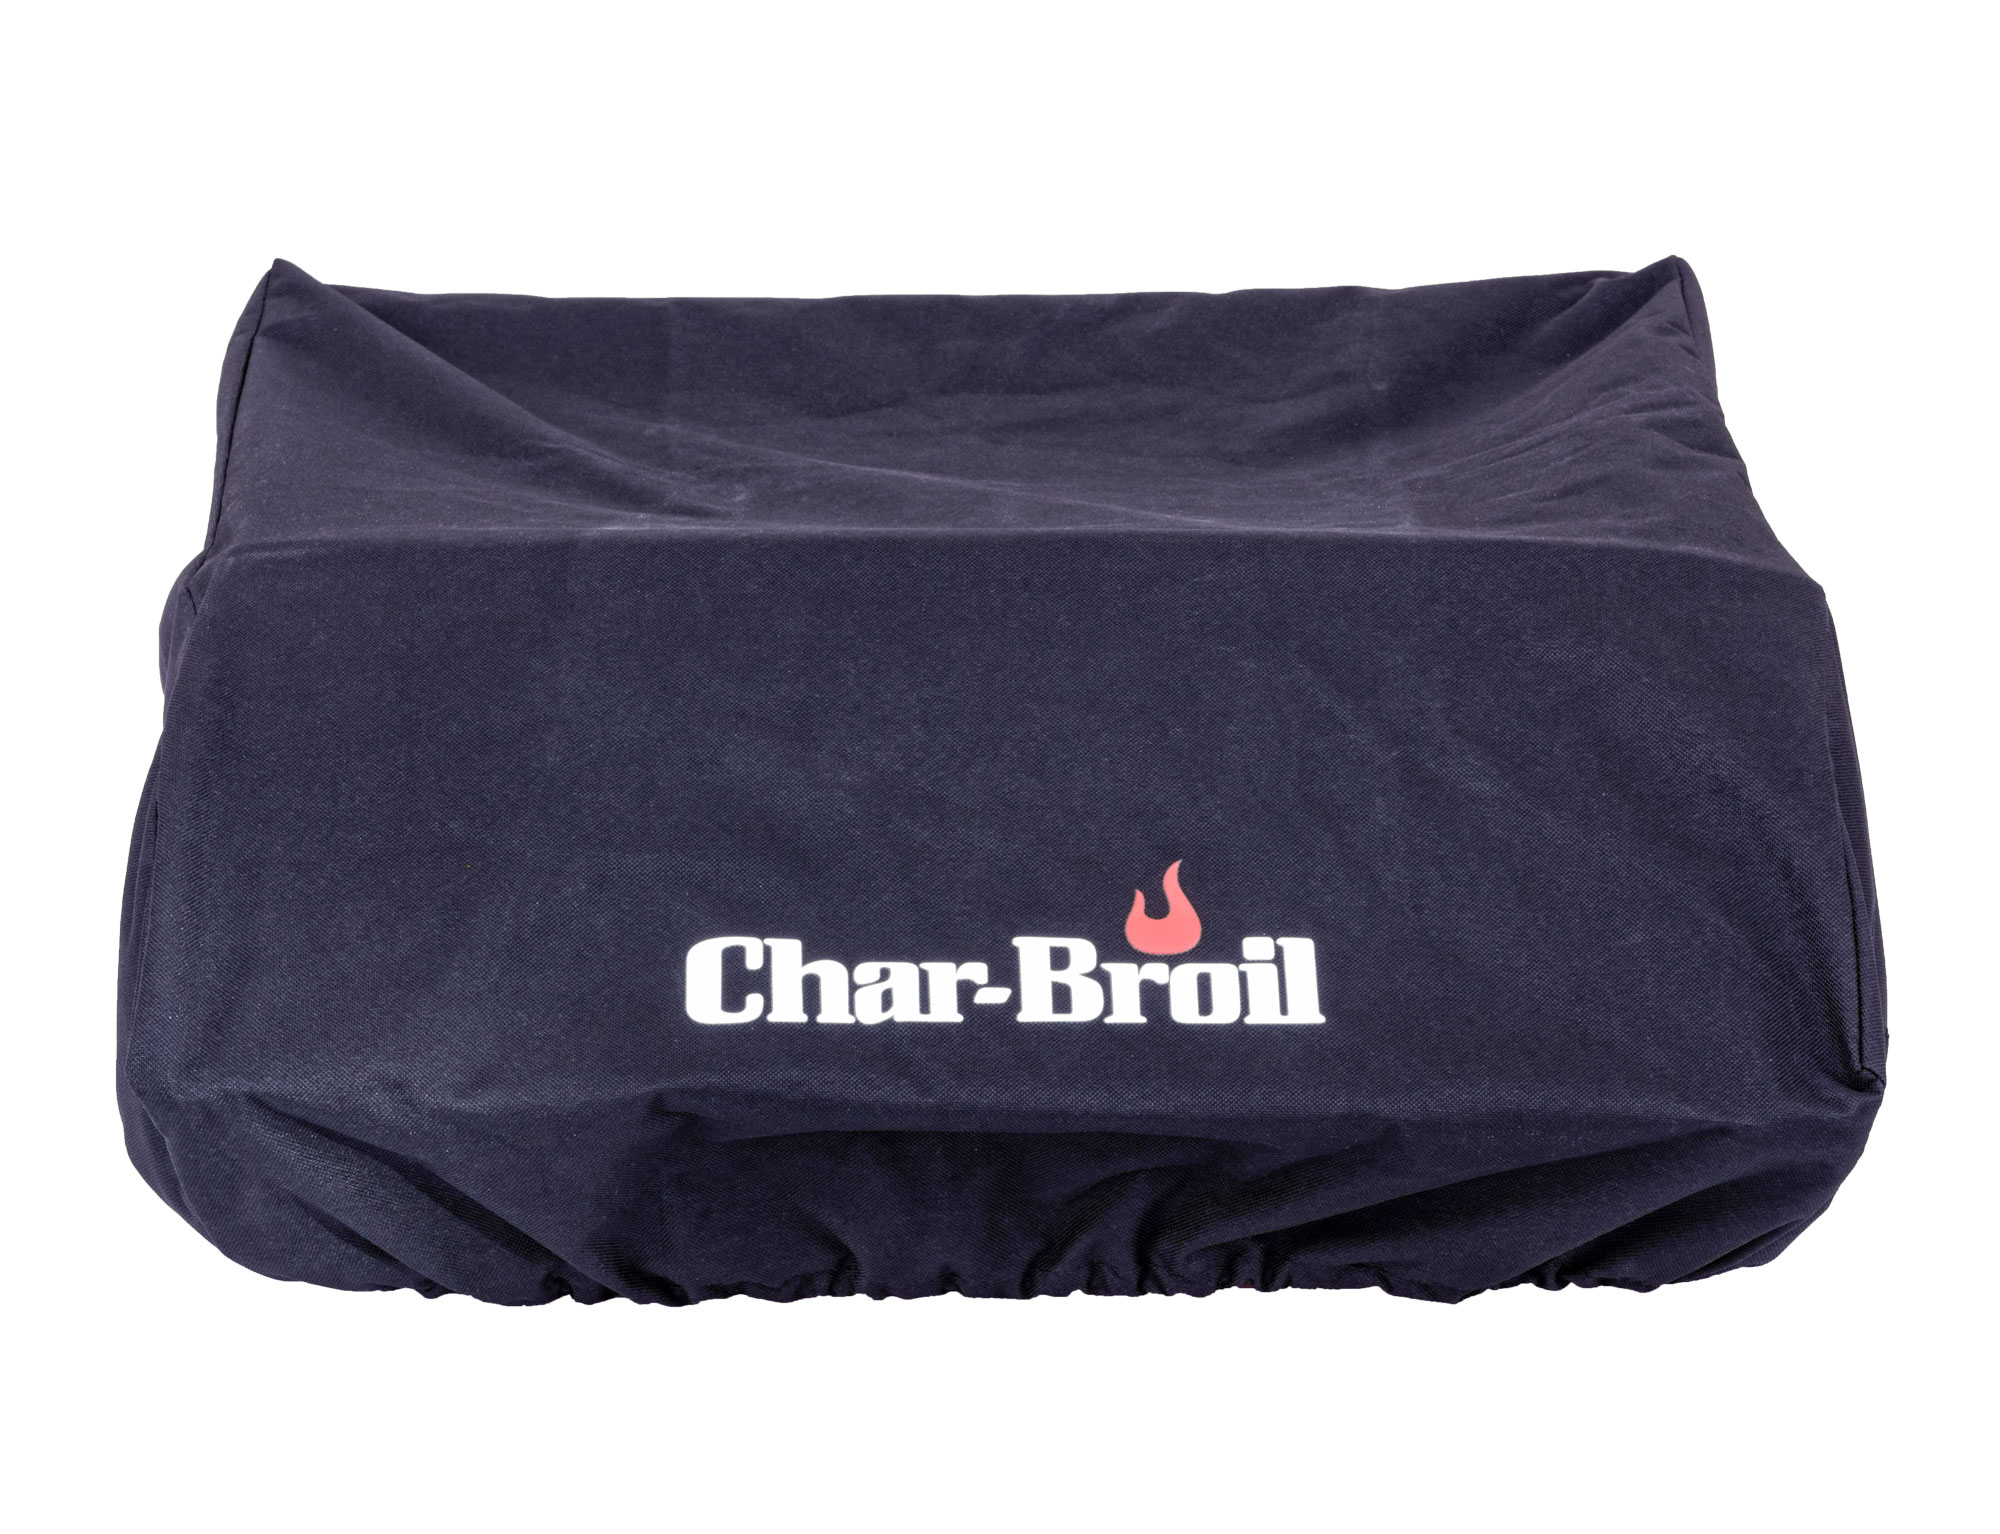 Char-Broil Schutzhülle für Plancha Grill Verano 200 Bild 1